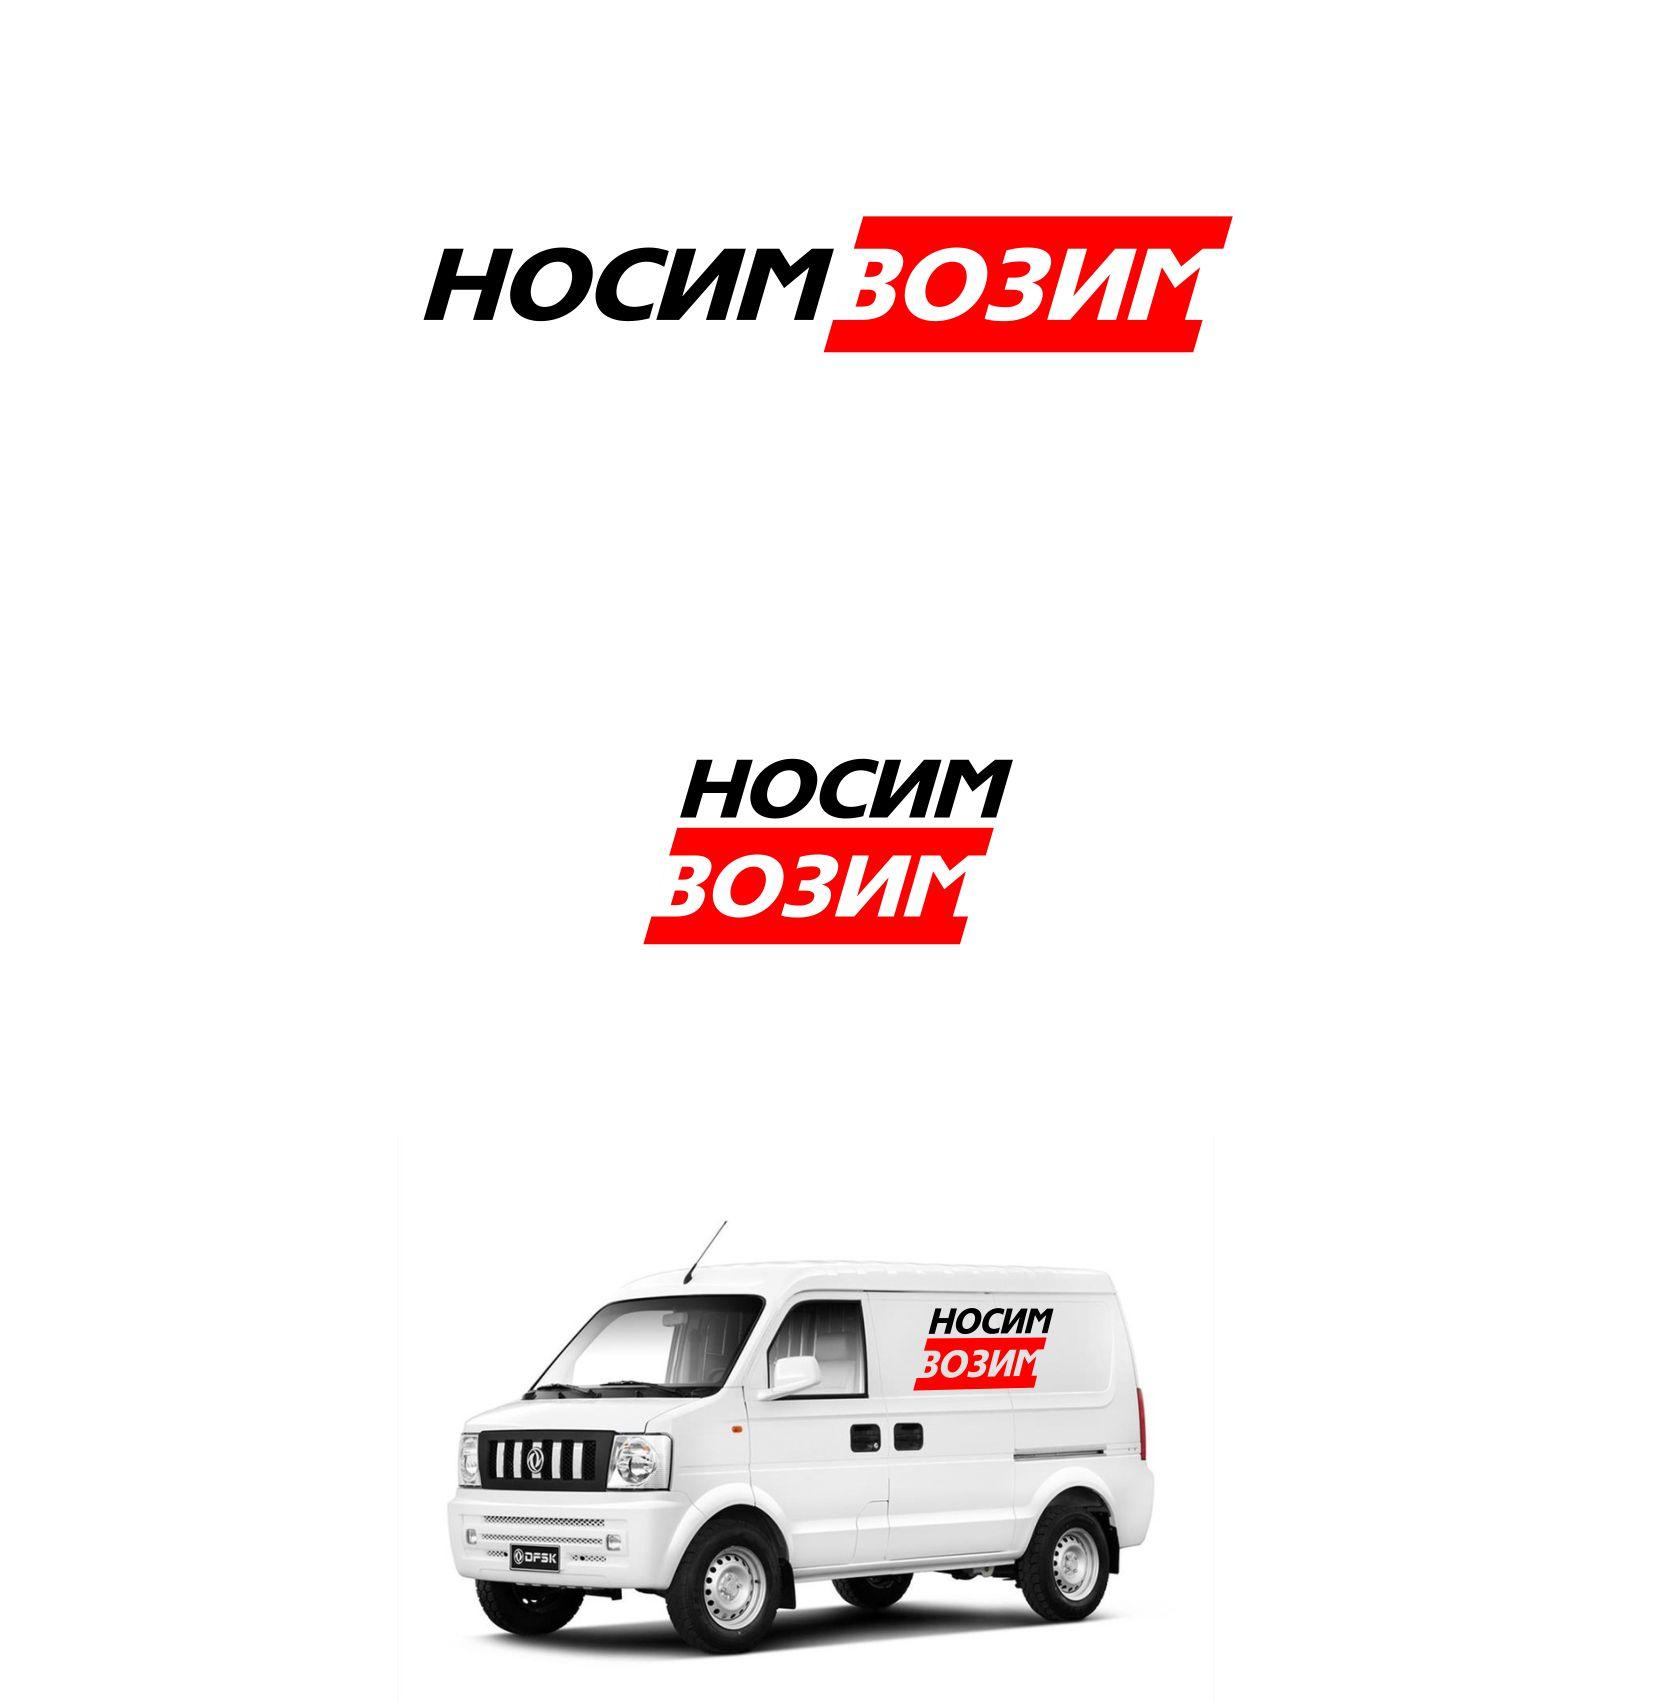 Логотип компании по перевозкам НосимВозим фото f_3795cf66f72834c0.jpg